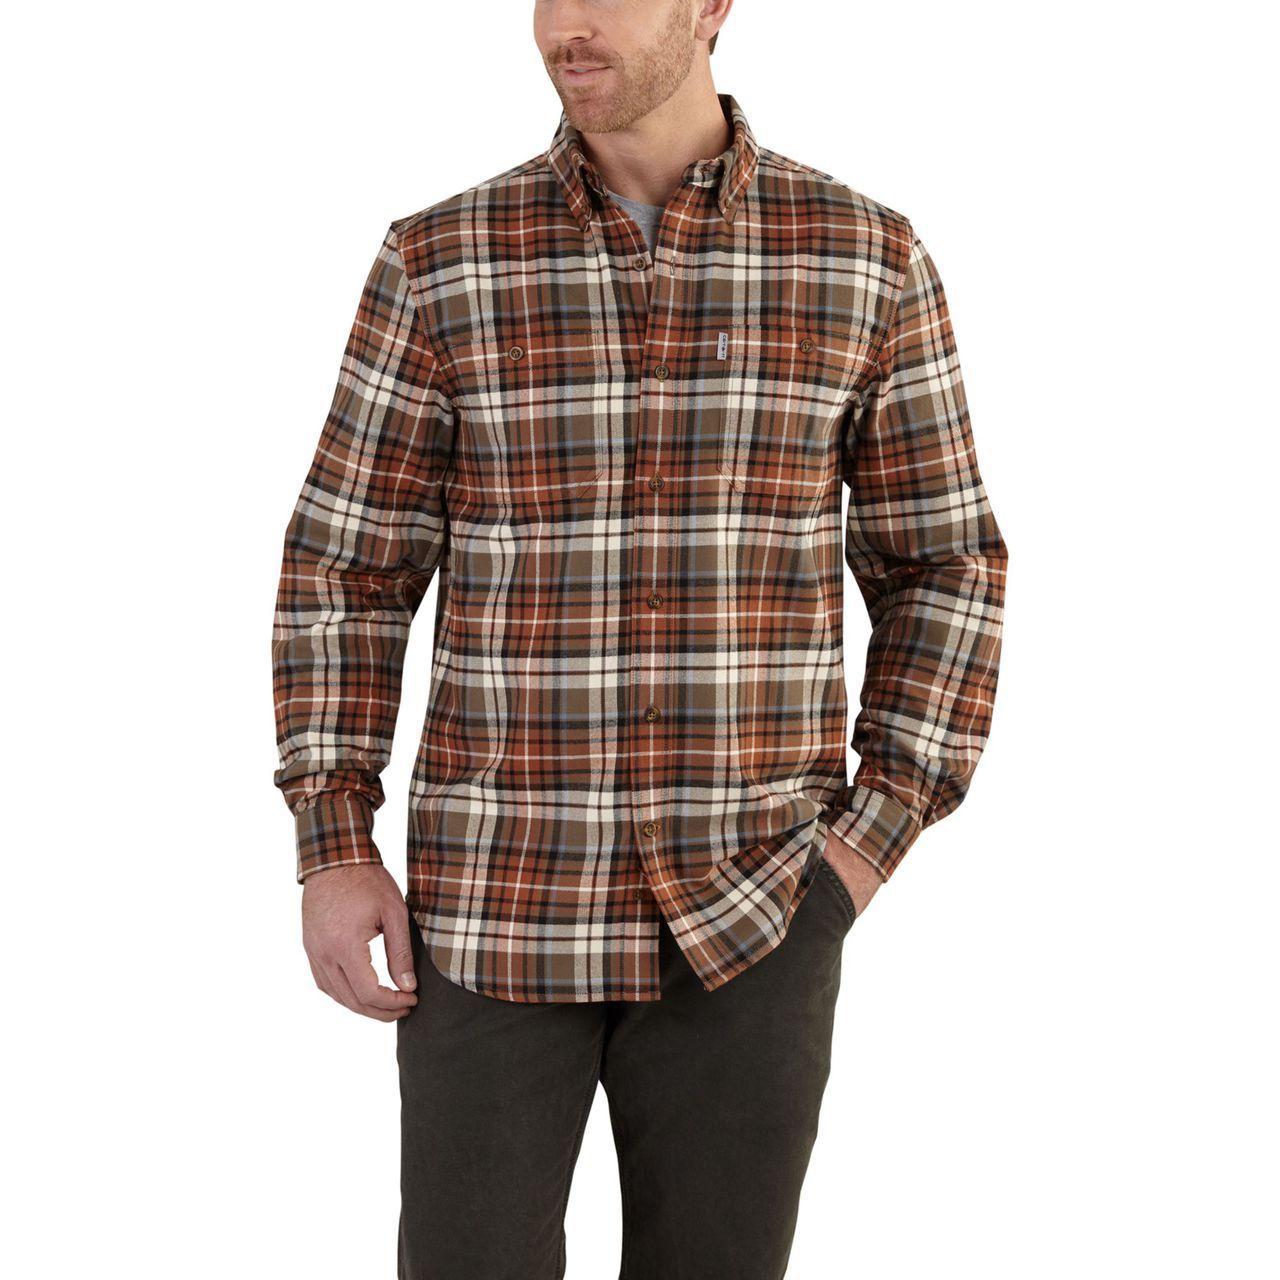 Flannel shirt knot  Trumbull Plaid Shirt  Carhartt and Plaid